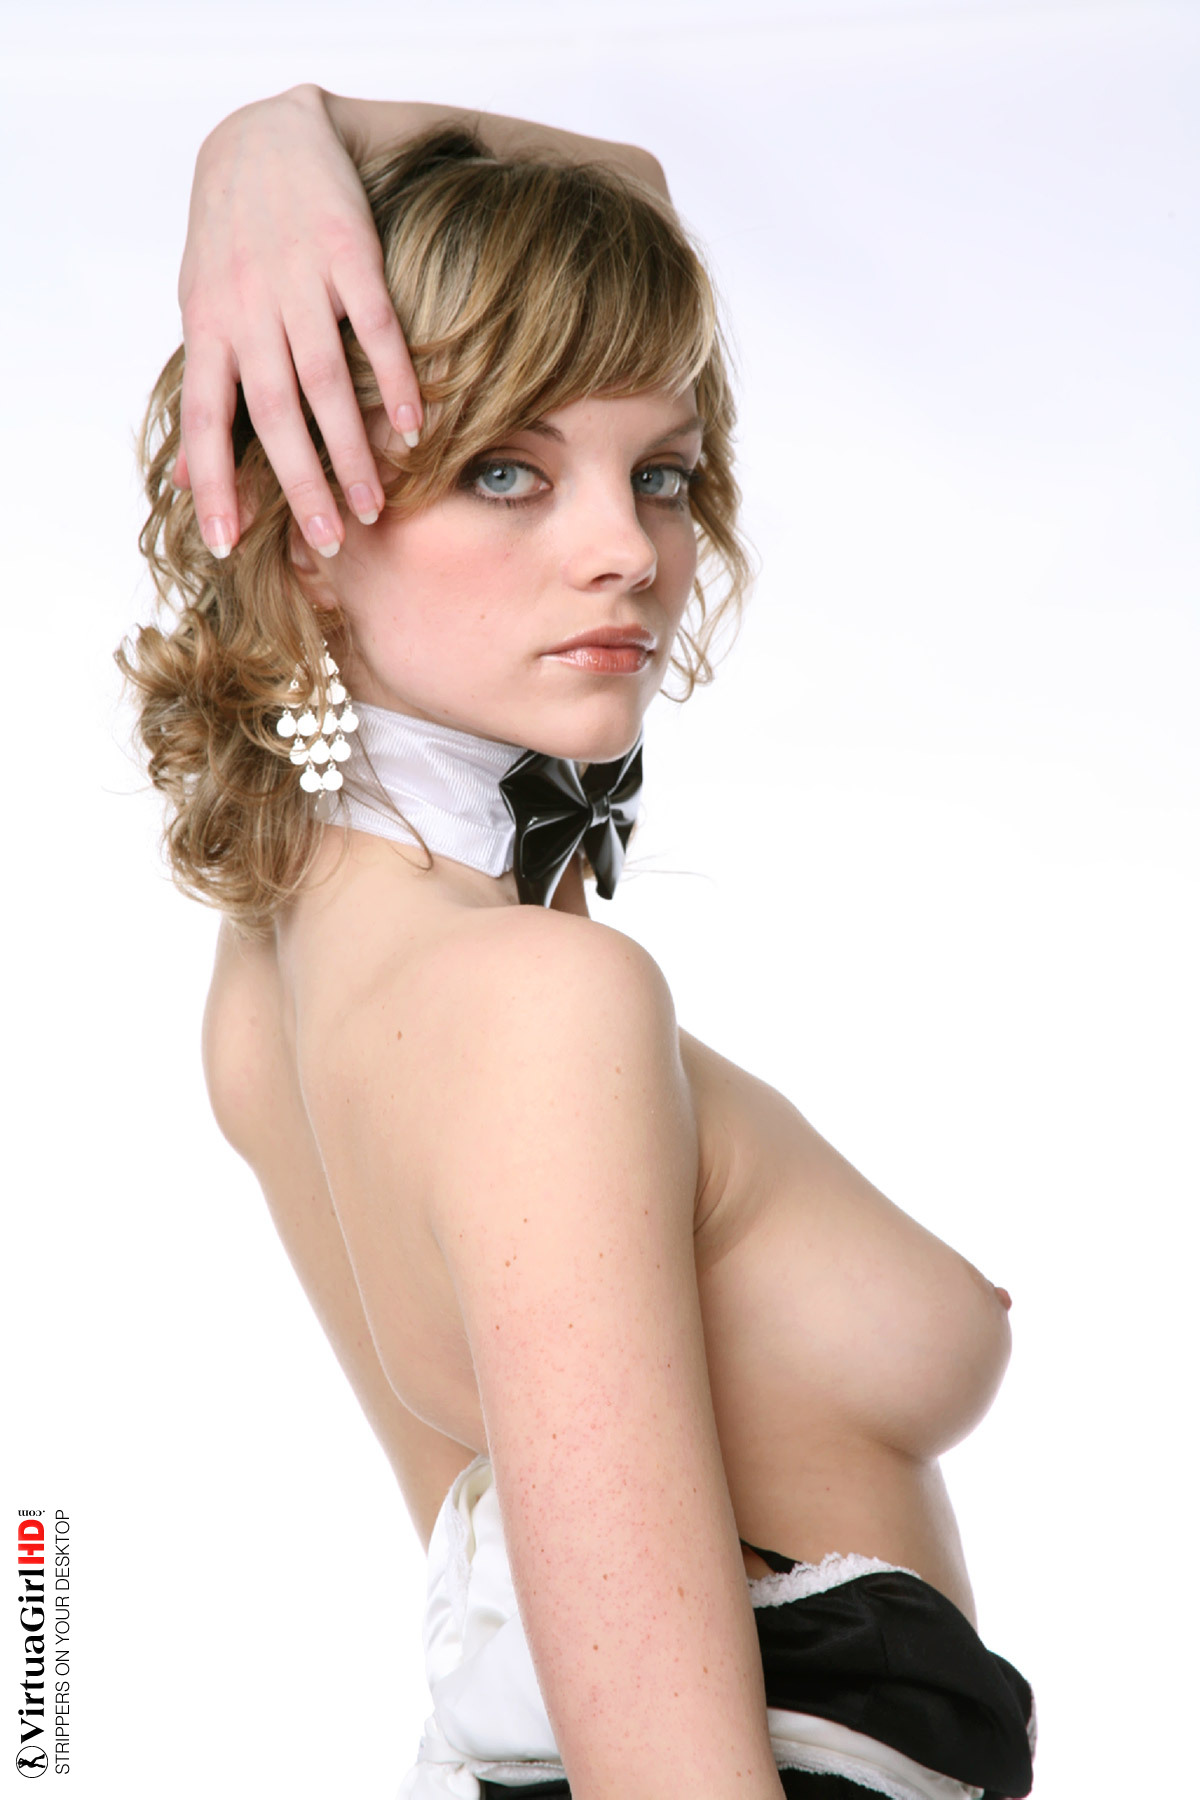 erotic desktop wallpaper